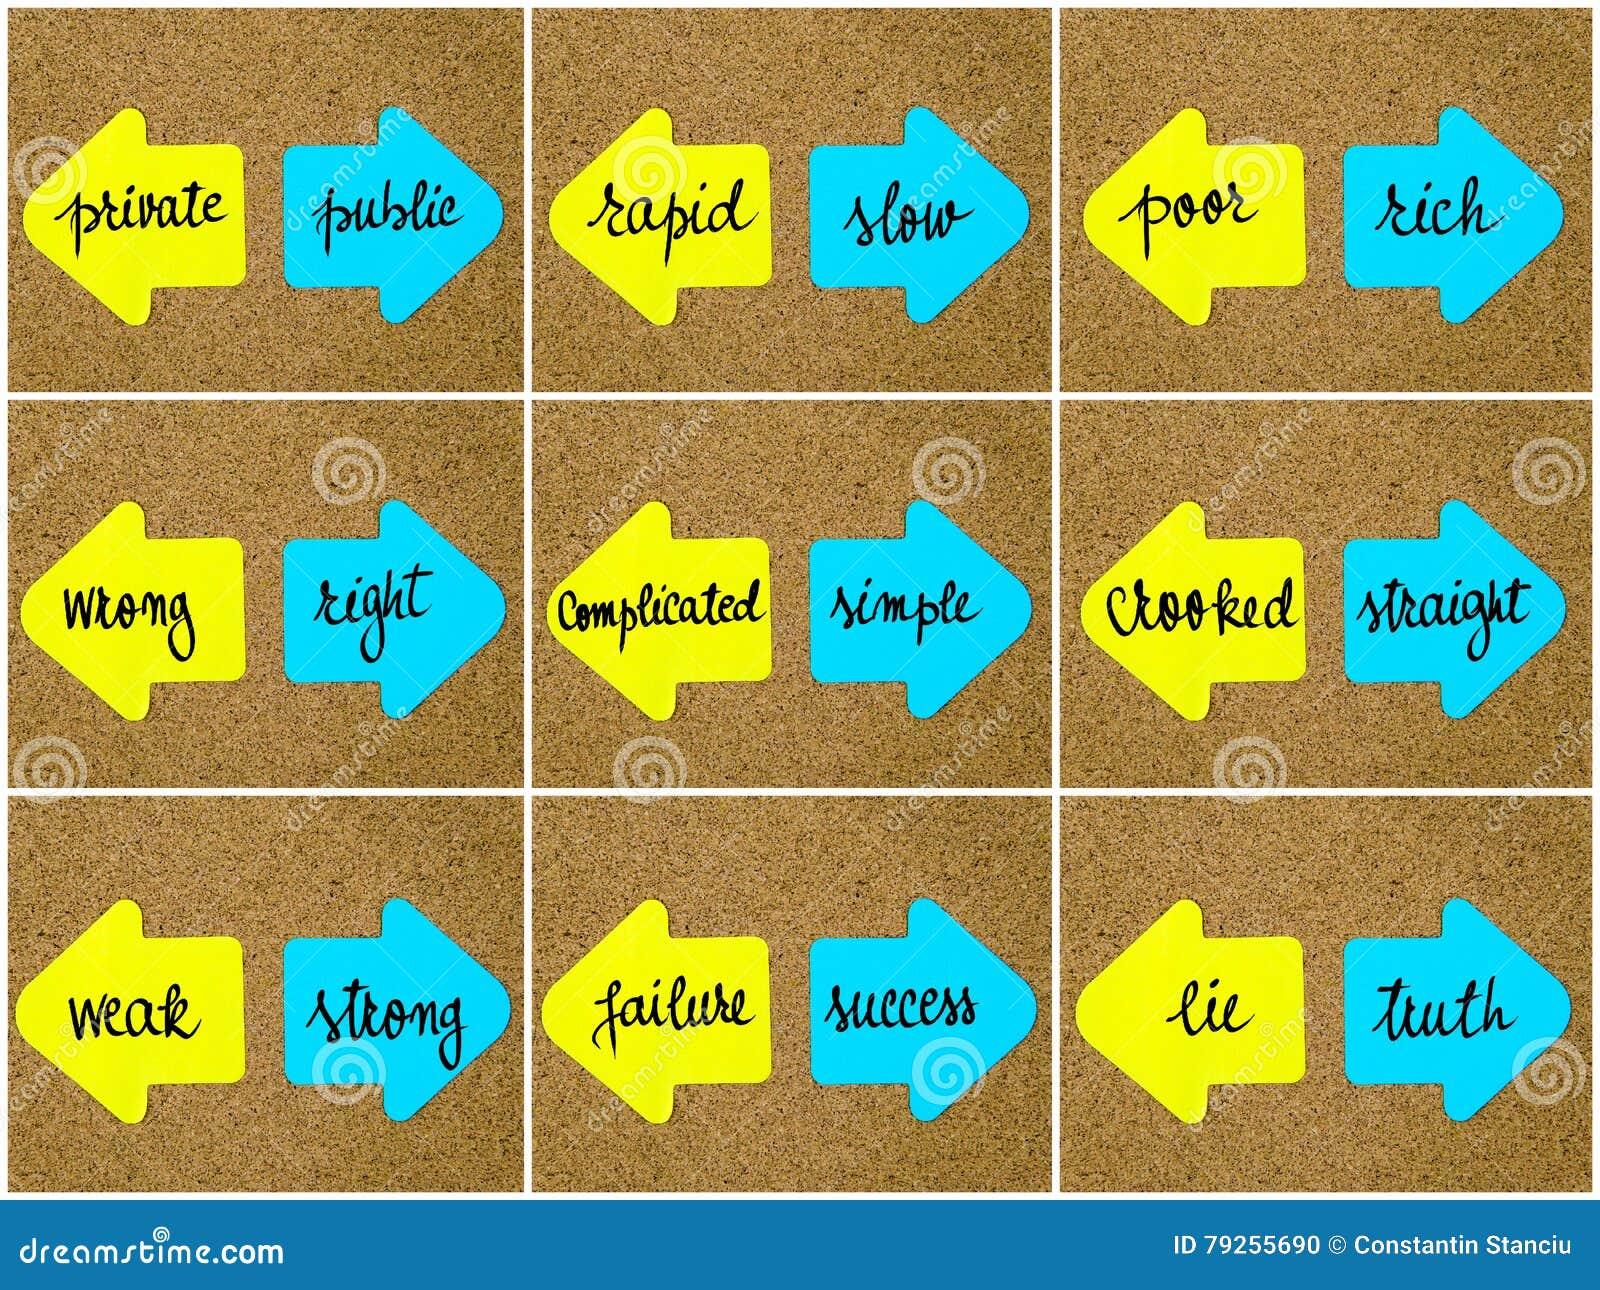 Antonym Concepts Written On Opposite Arrows Stock